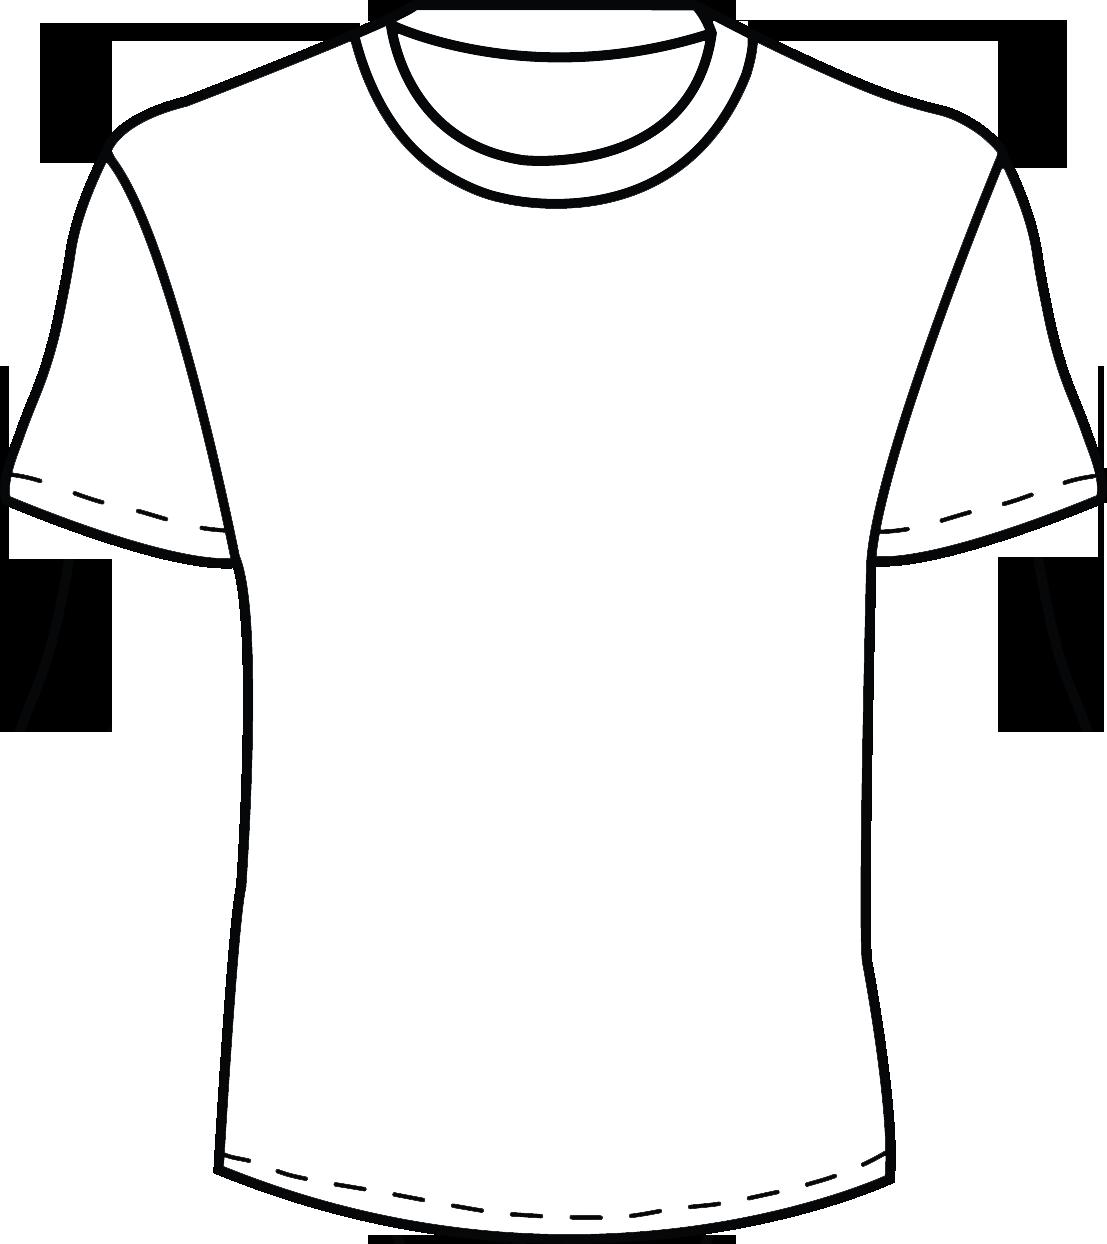 Shetland sheepdog t shirt. Hoodie clipart transparent